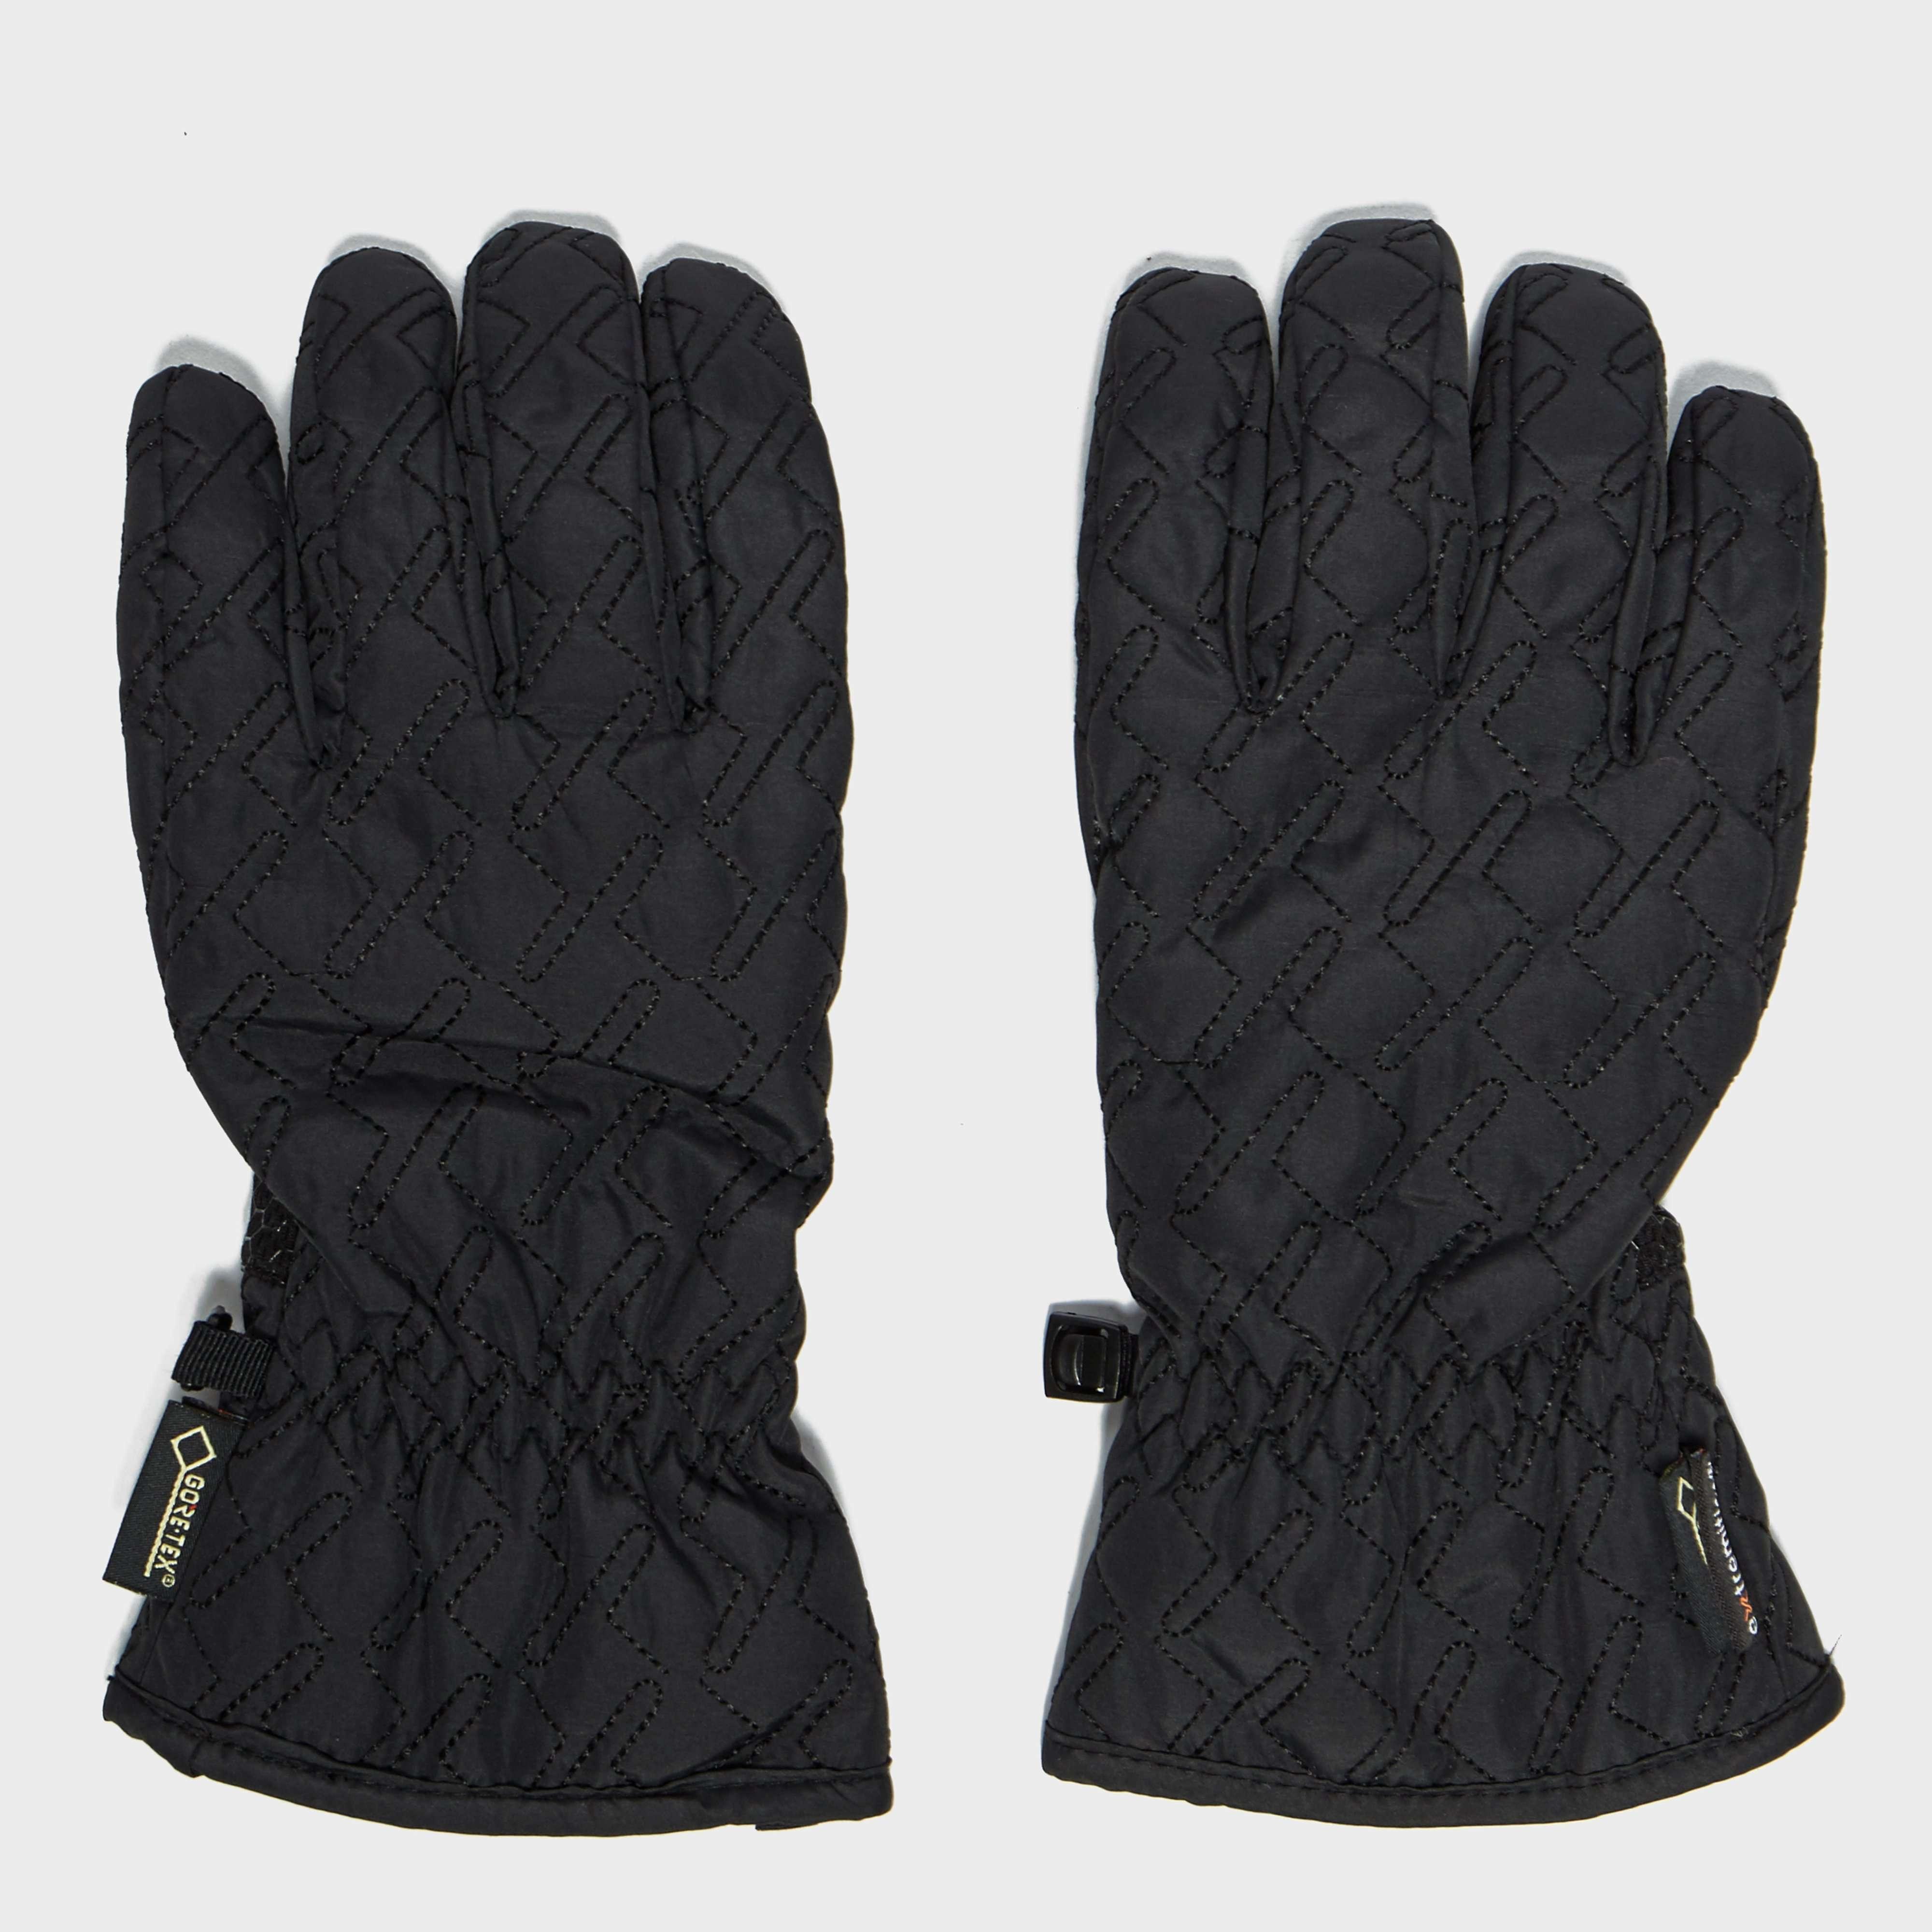 EXTREMITIES Women's Haze Gore-Tex® Glove